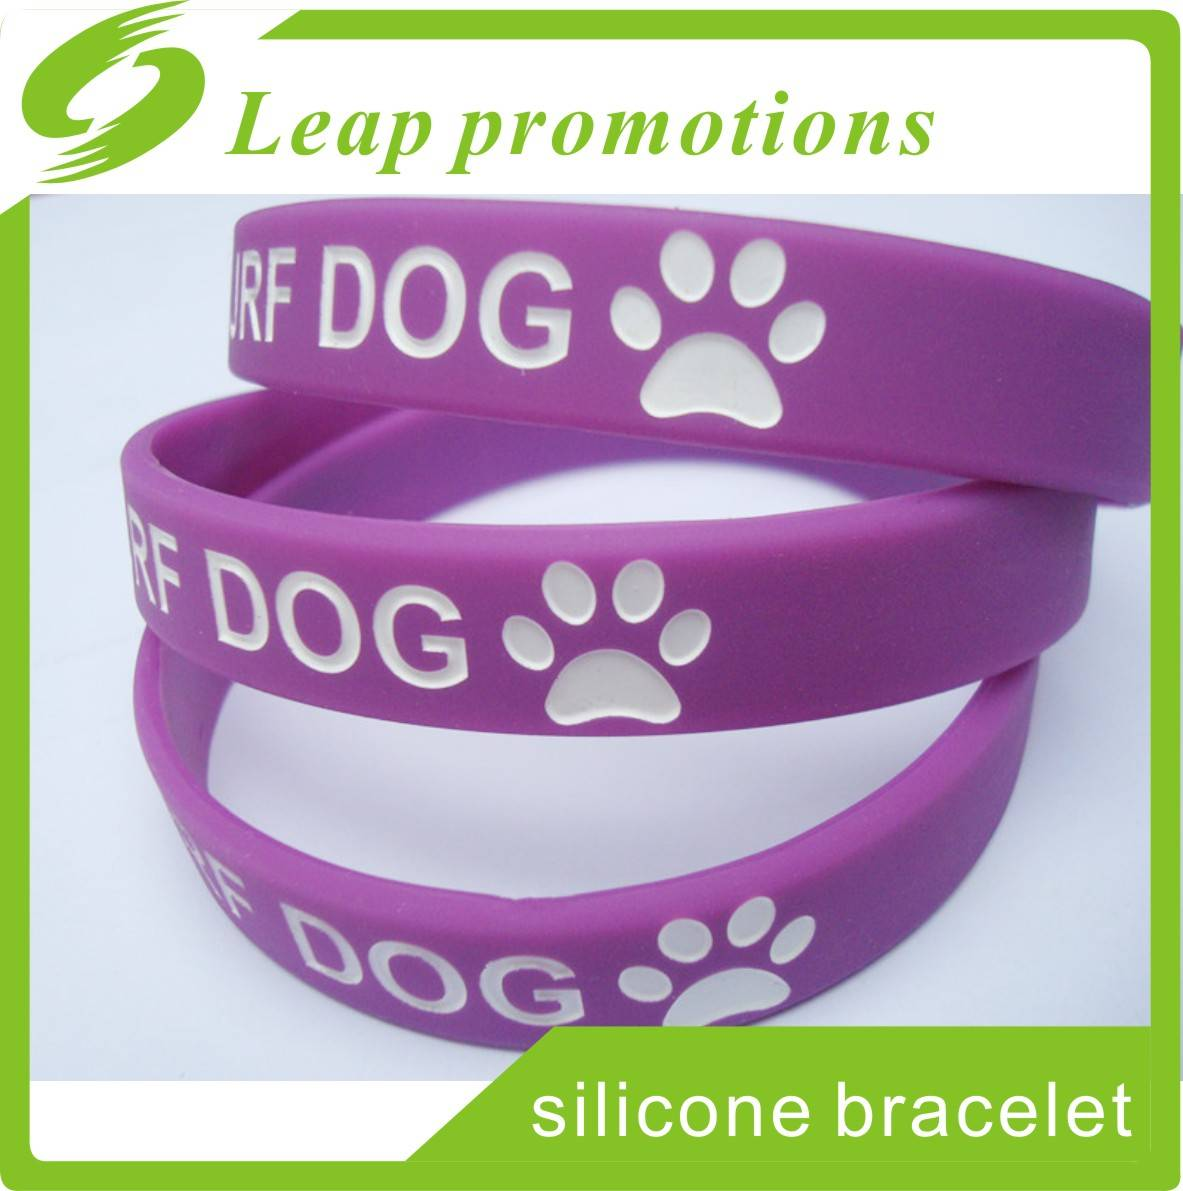 protect animal bracelets awareness silicone wristband